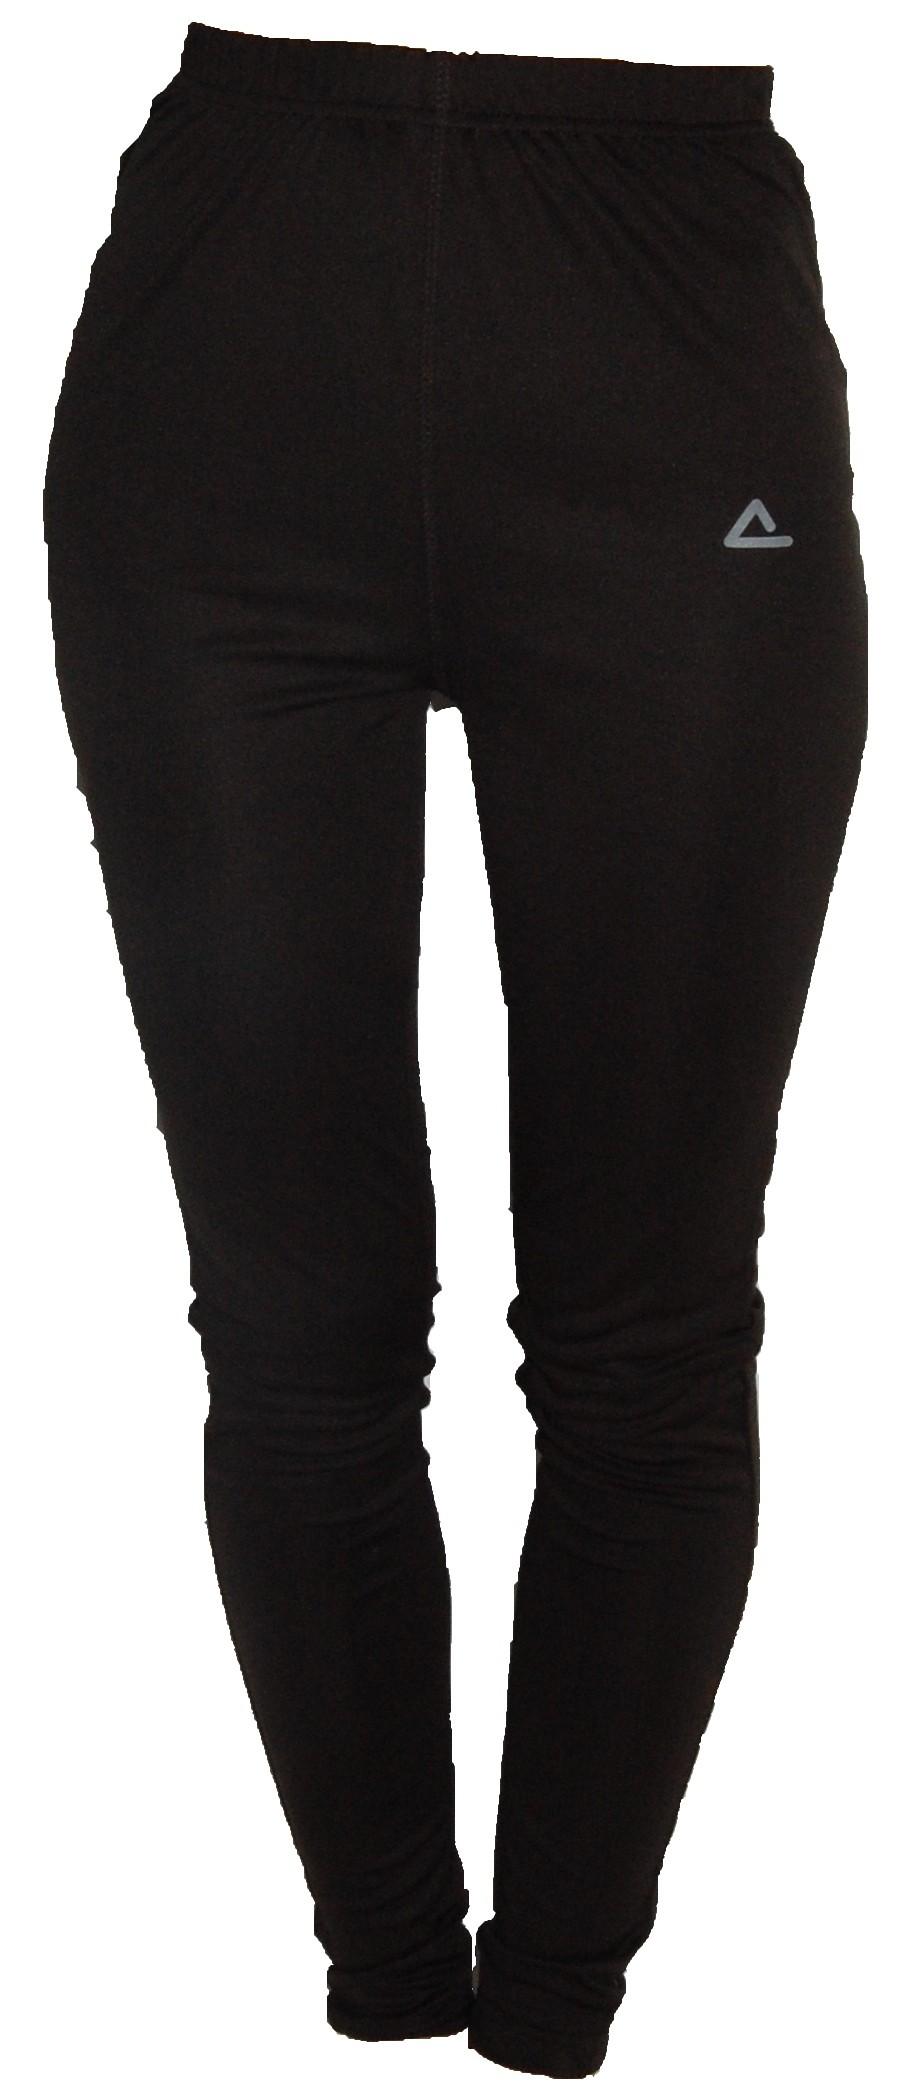 Legging Vêtement Femme Dare 2be Black Climatise Sous W 1KlFcJ